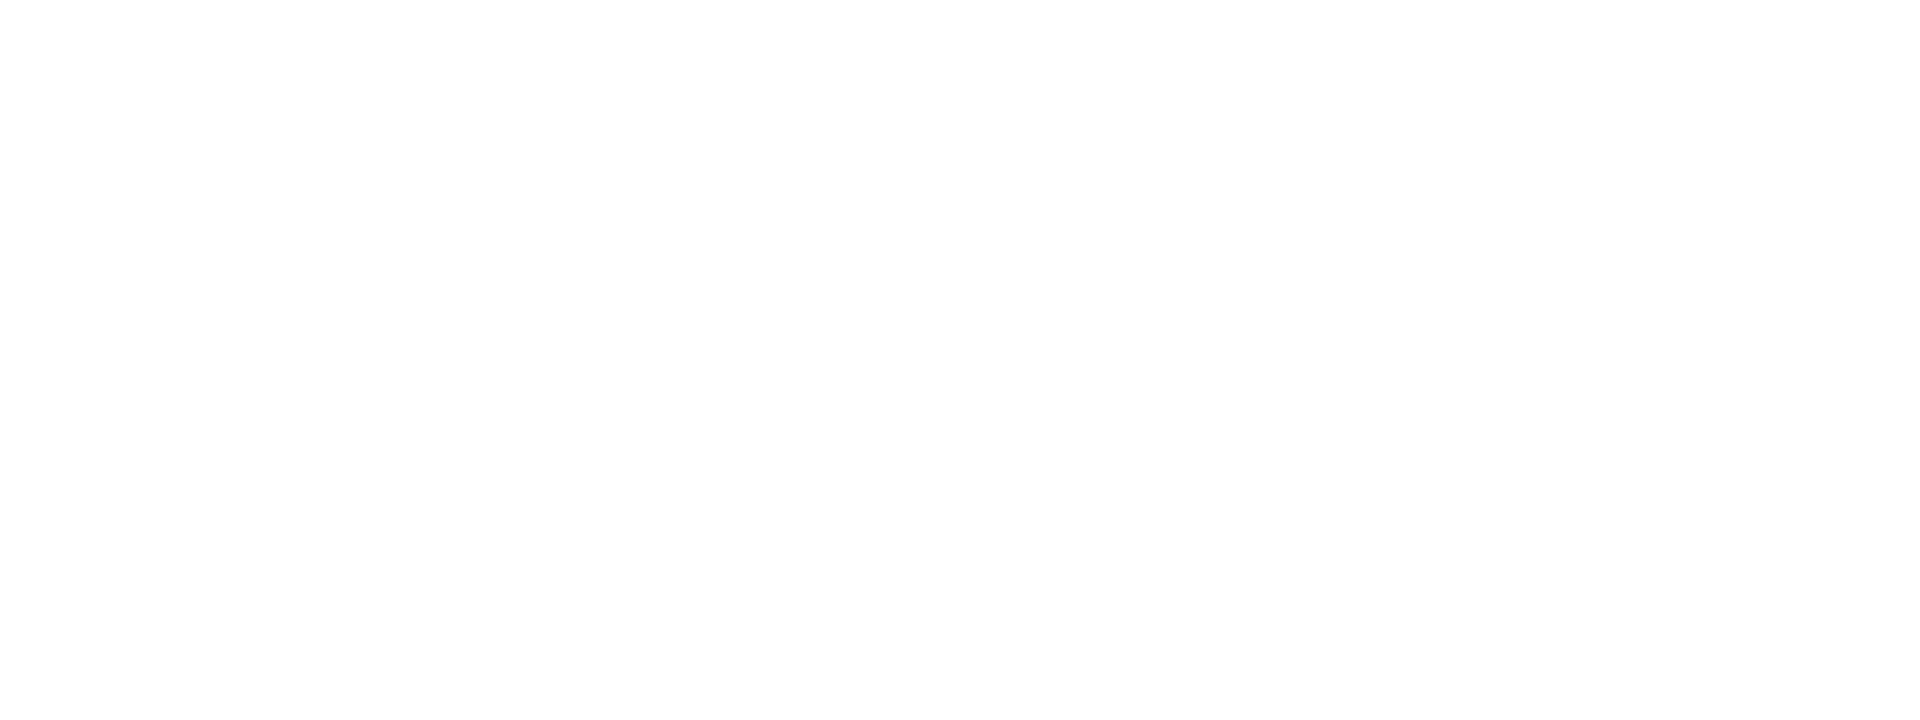 779ea3968e3a4 TechnipFMC plc